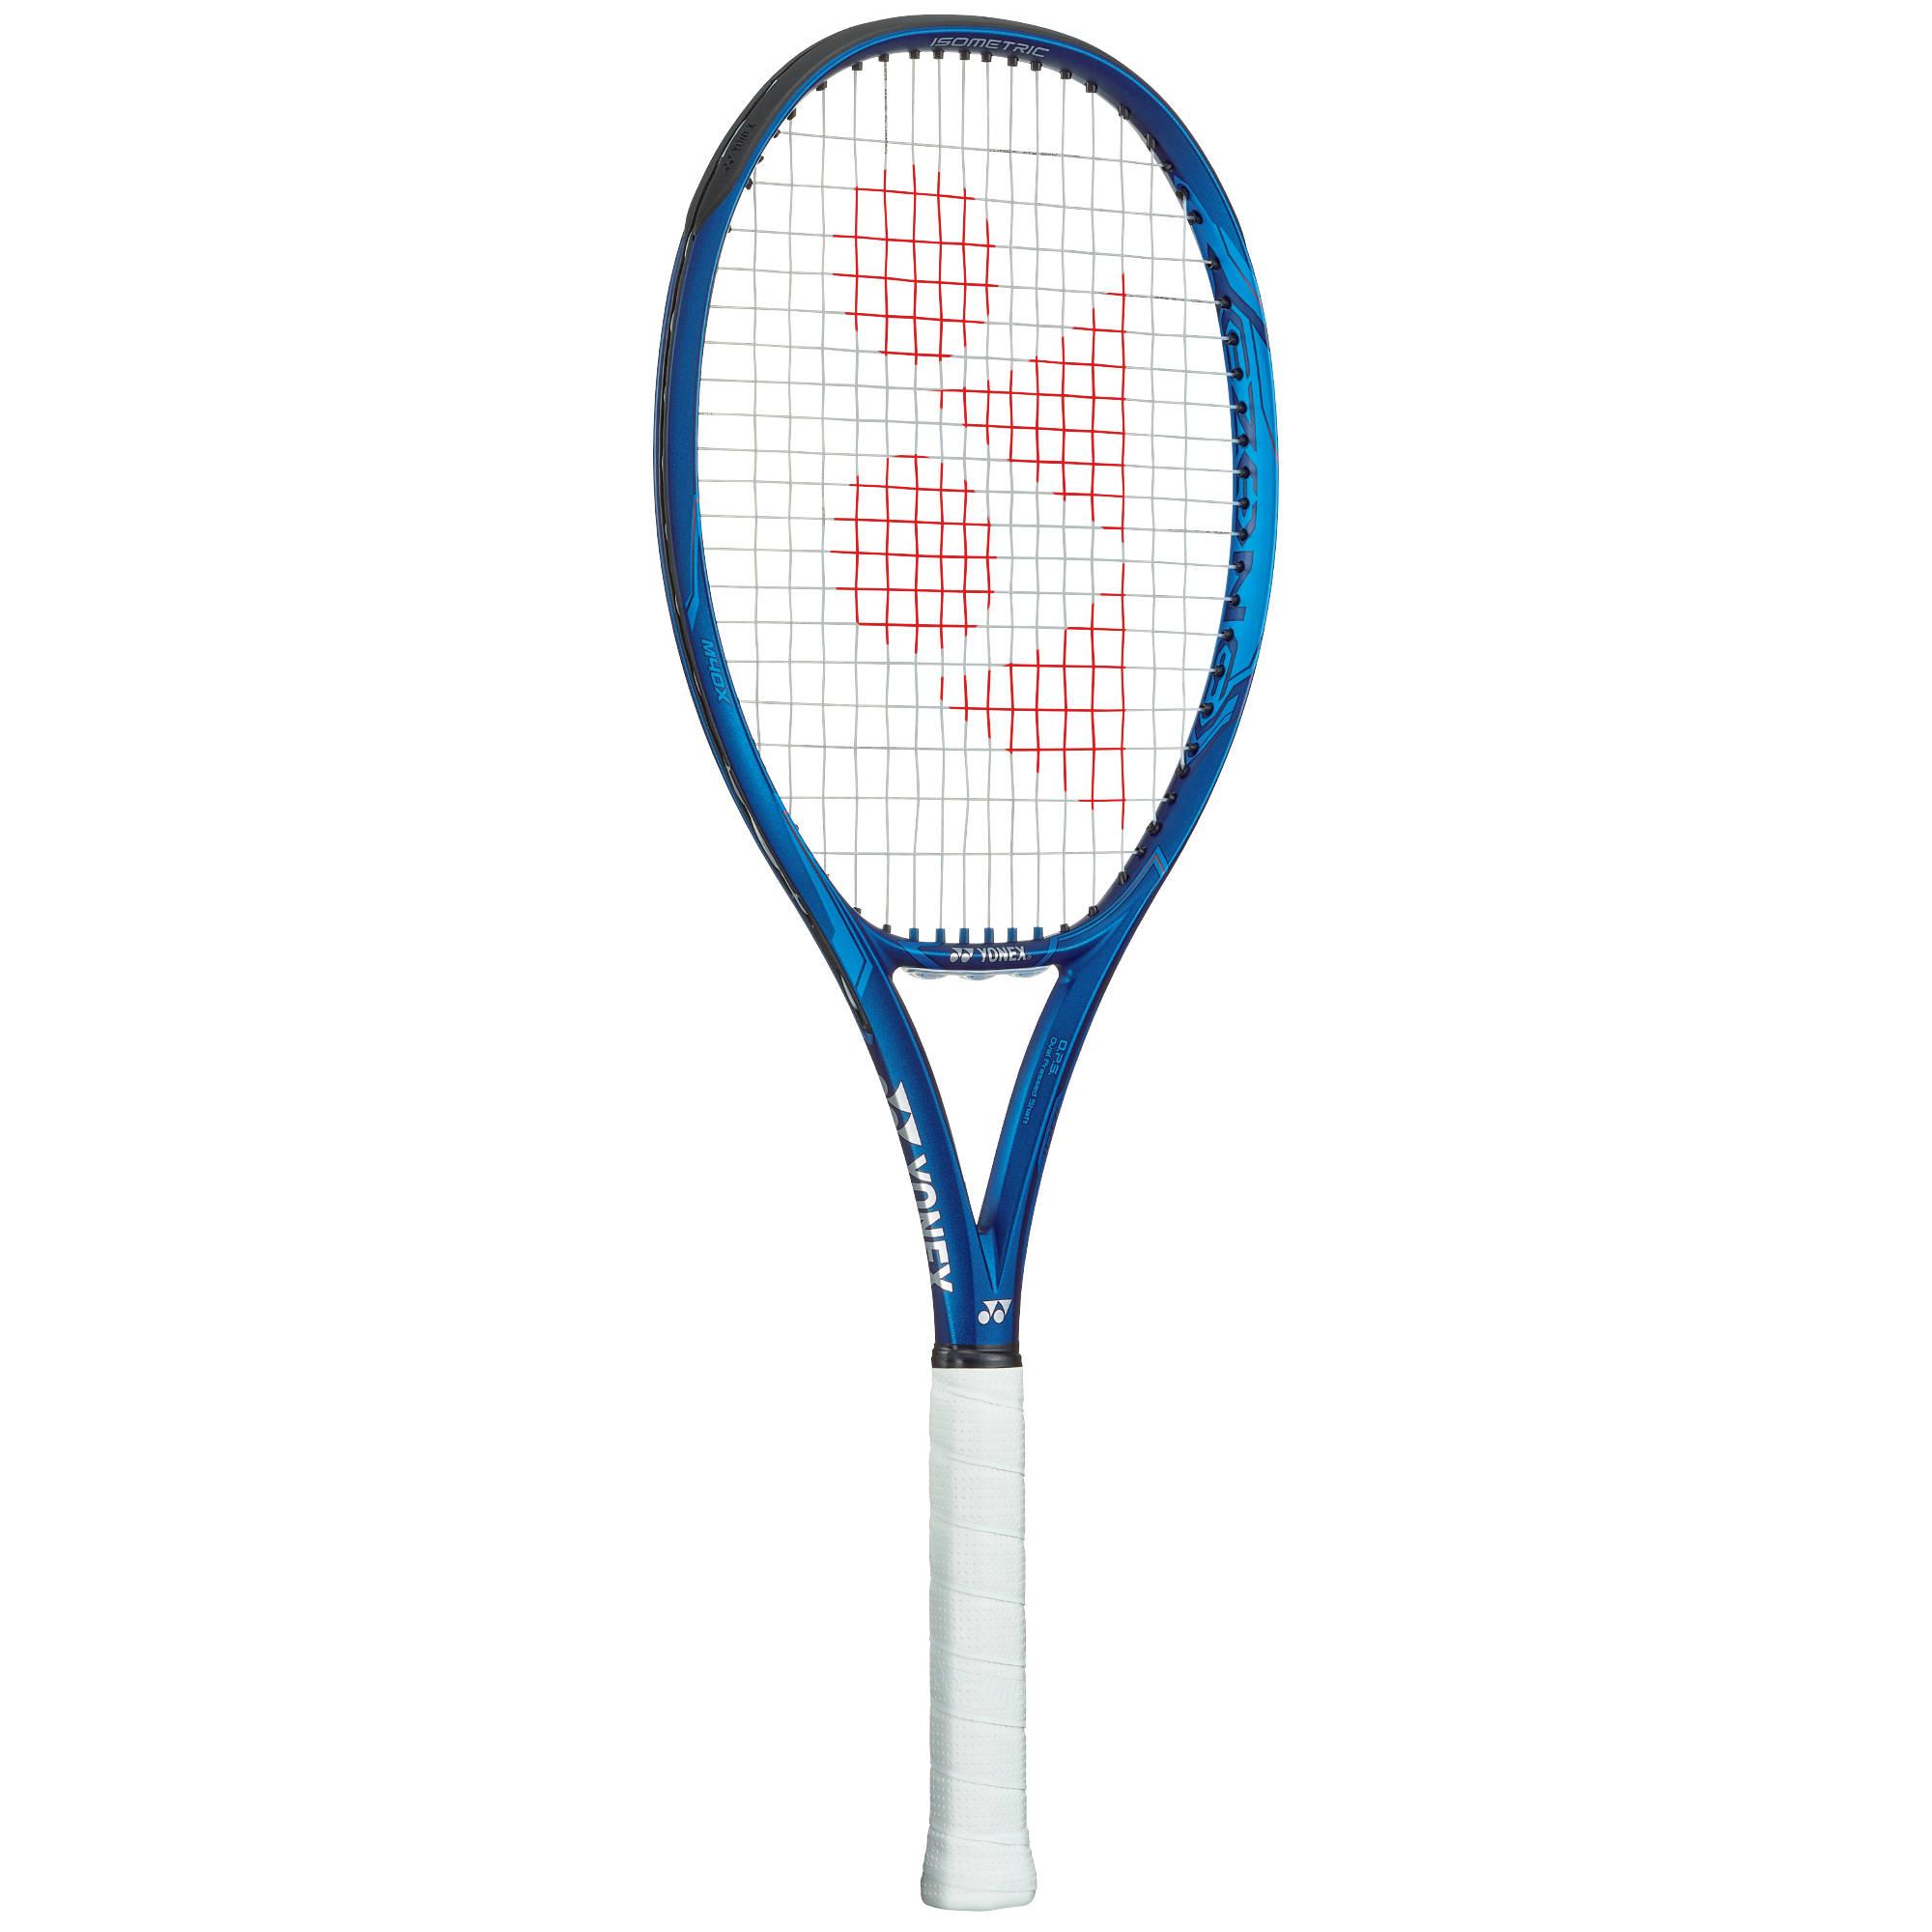 Yonex EZONE 108 Tennis Racket - Grip 3